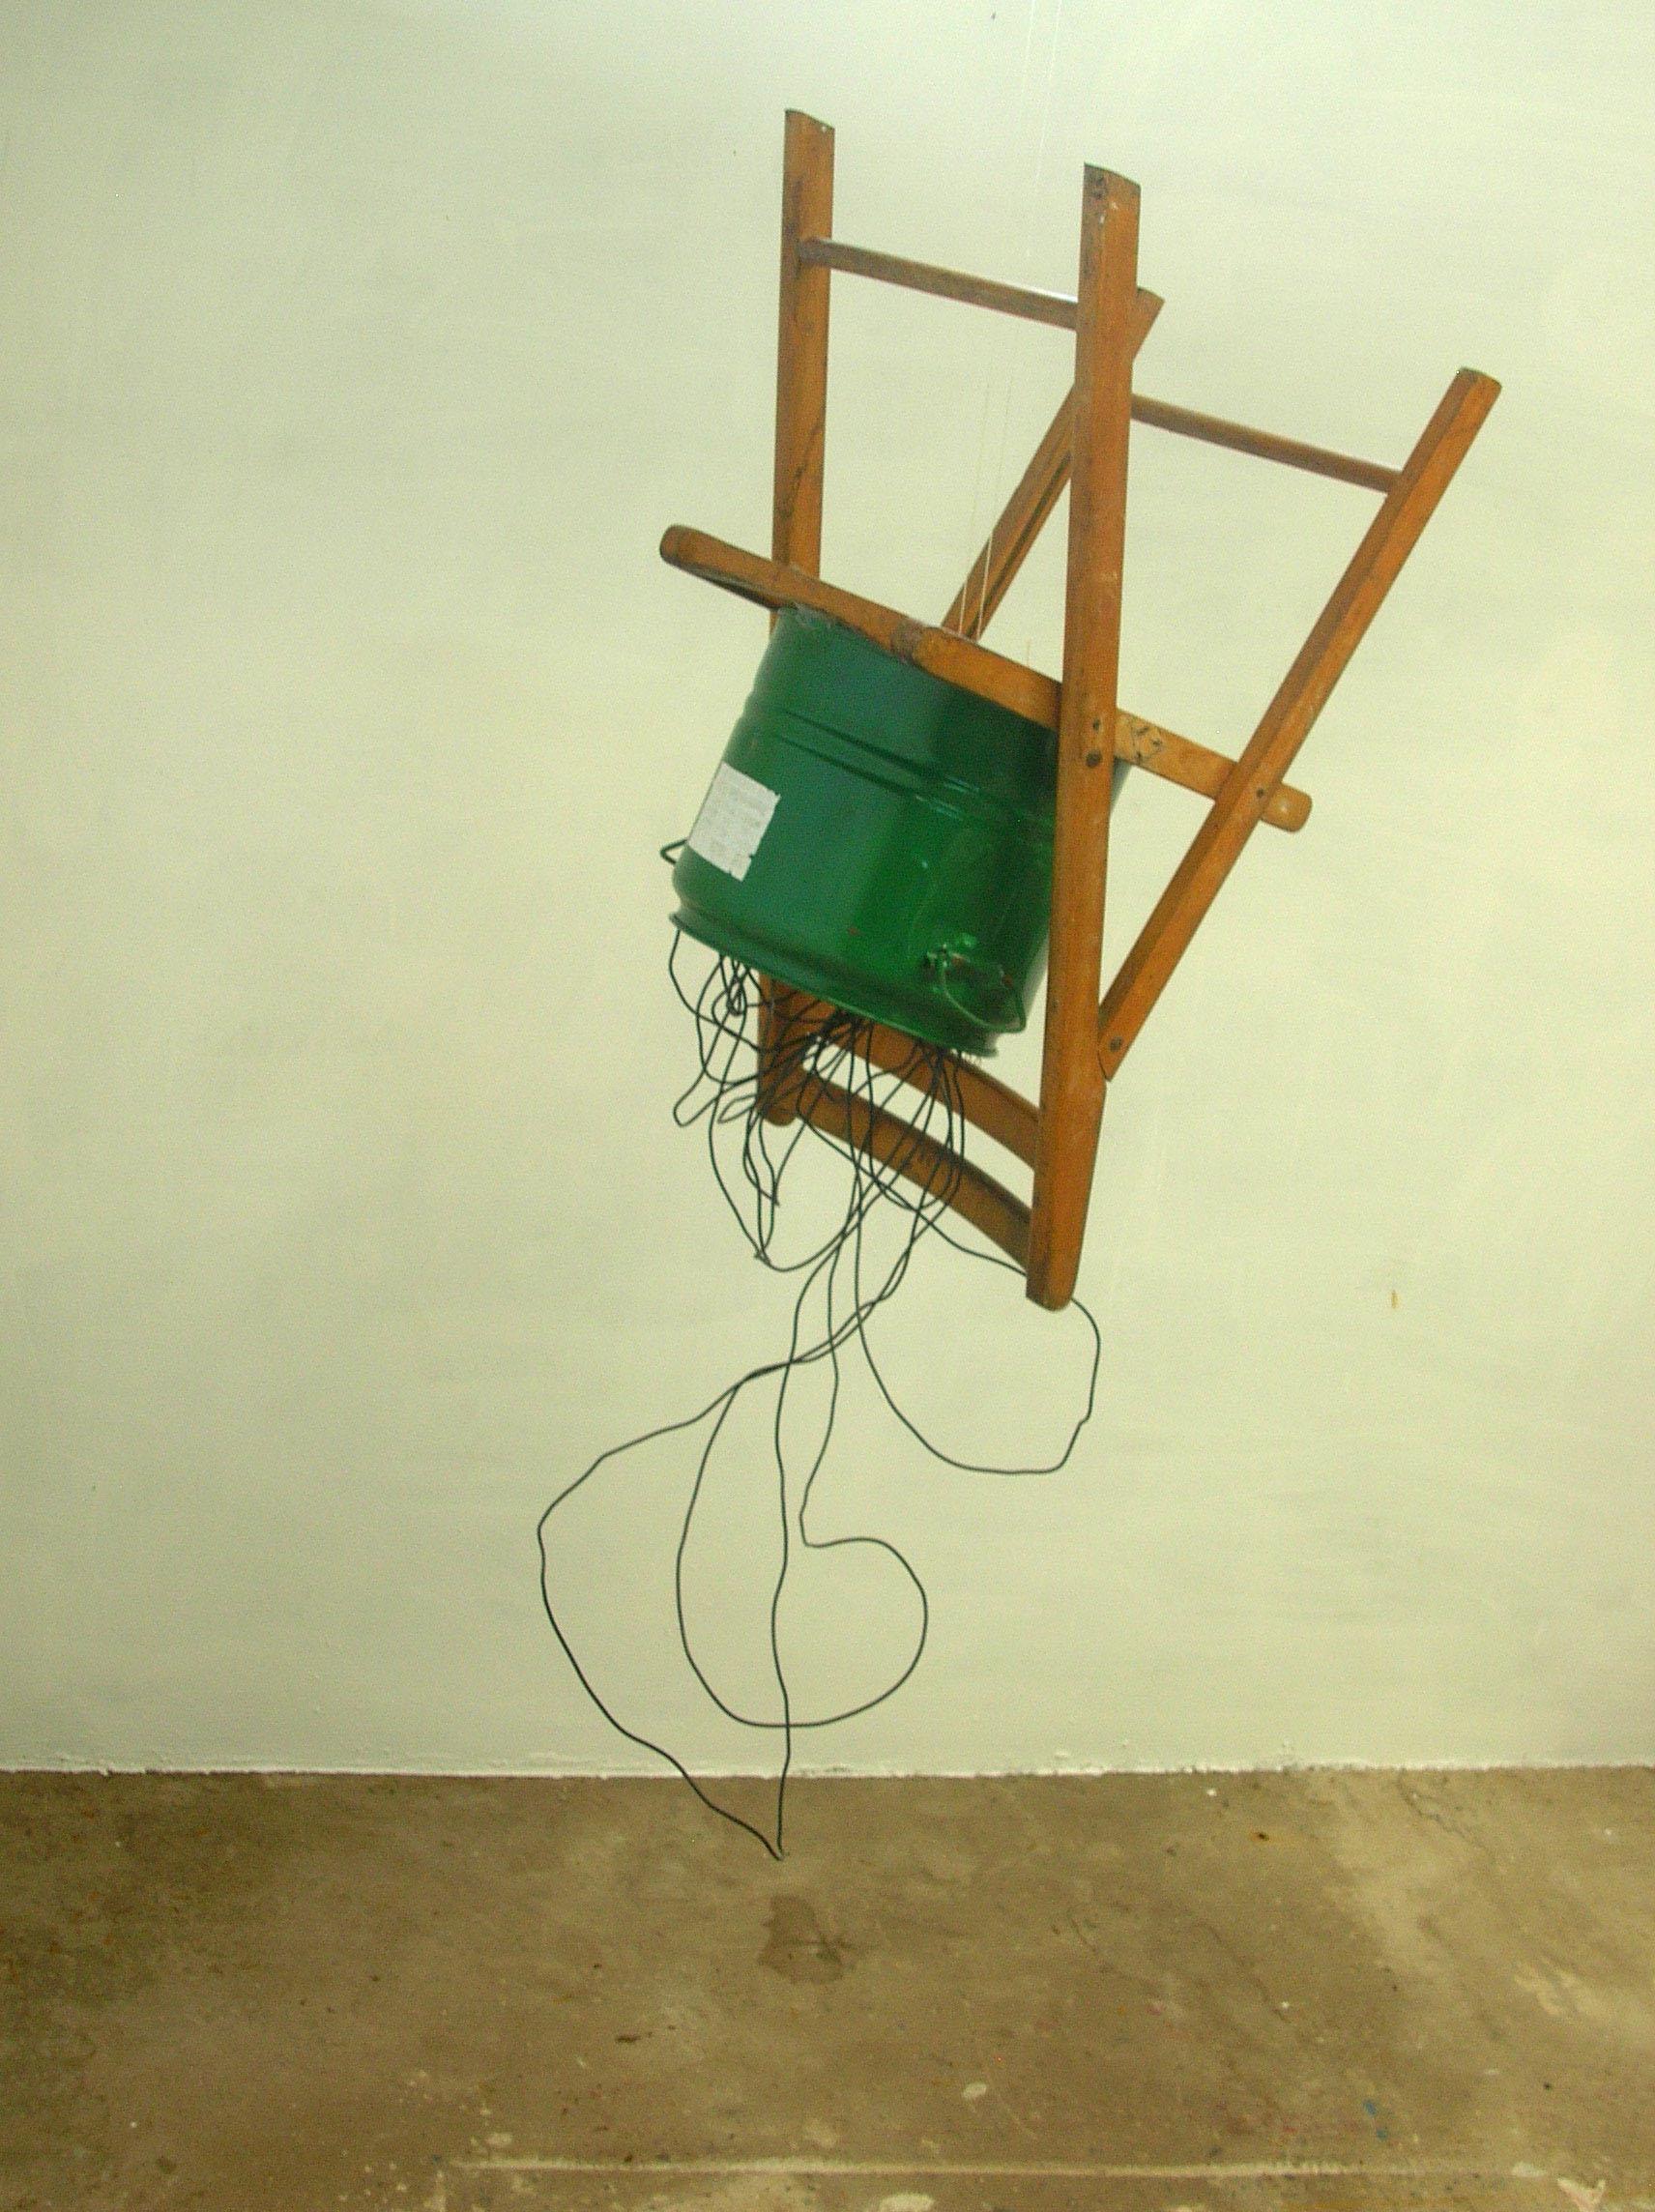 fasang nava aran @ minimal exposition